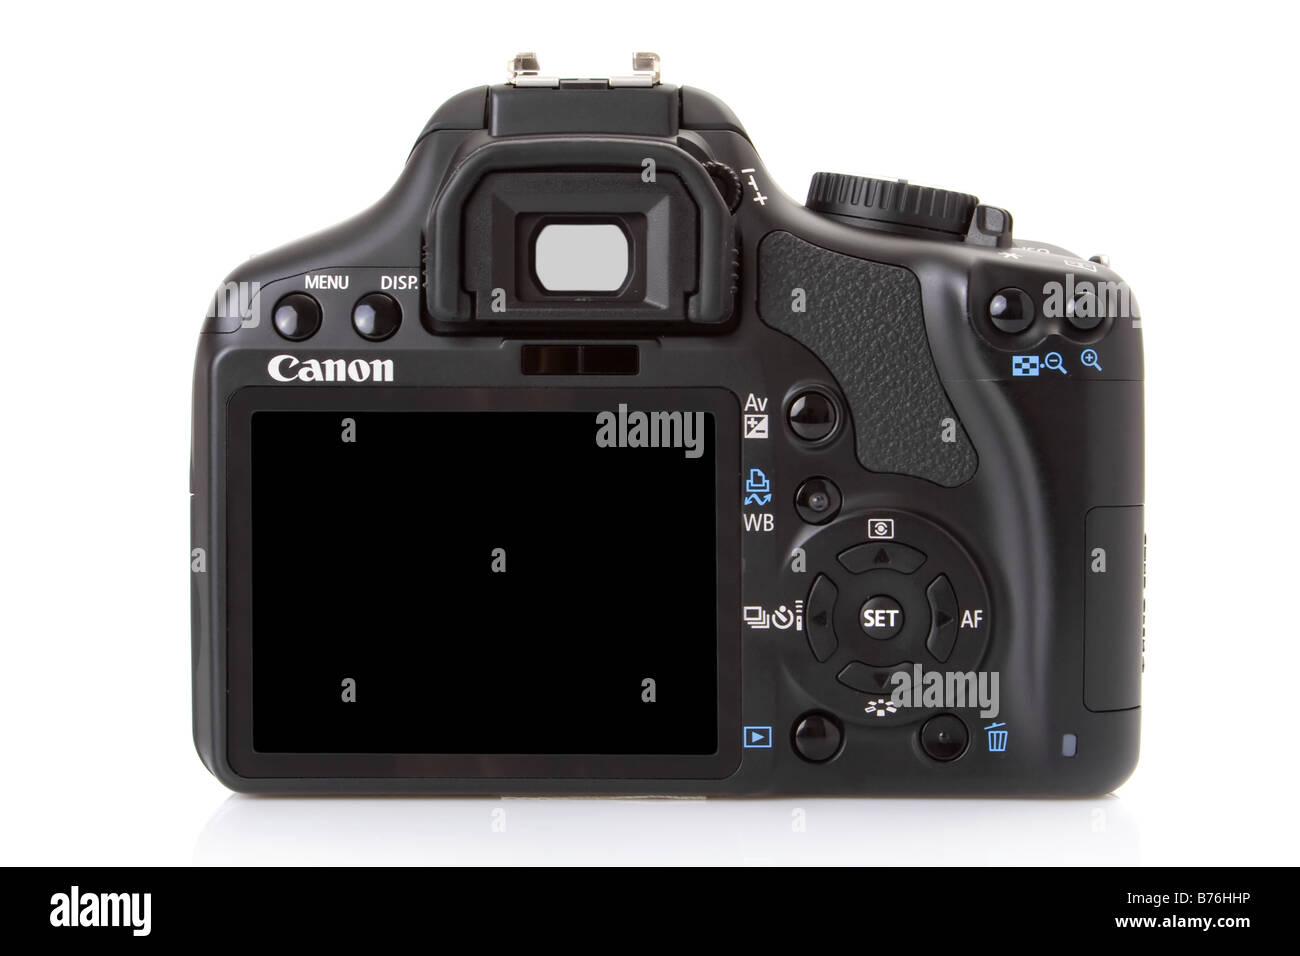 Back of a Canon EOS 450D (Rebel XSi), 12 megapixel digital slr. - Stock Image